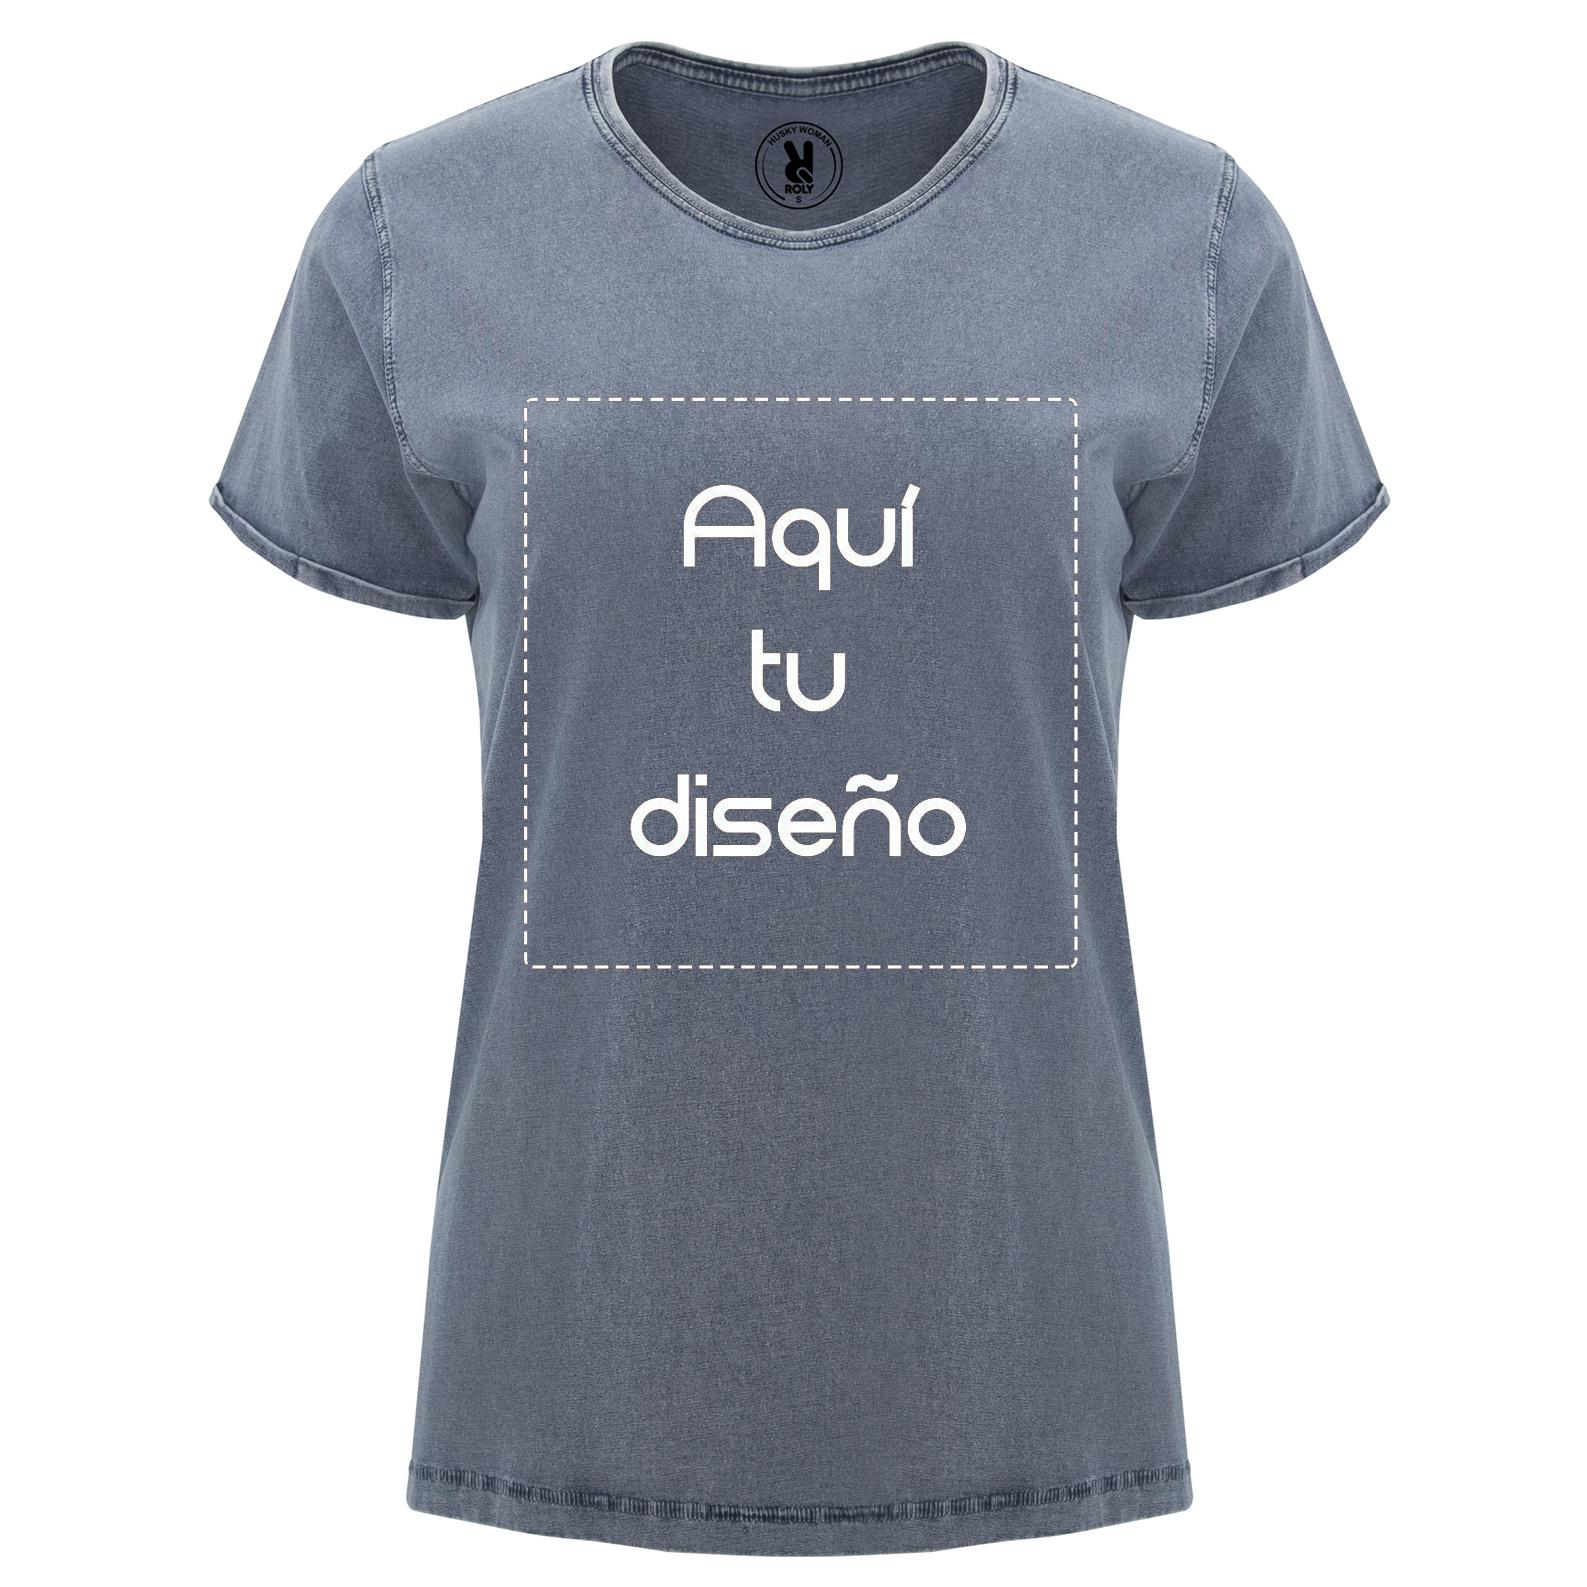 Camiseta vintage azul mujer